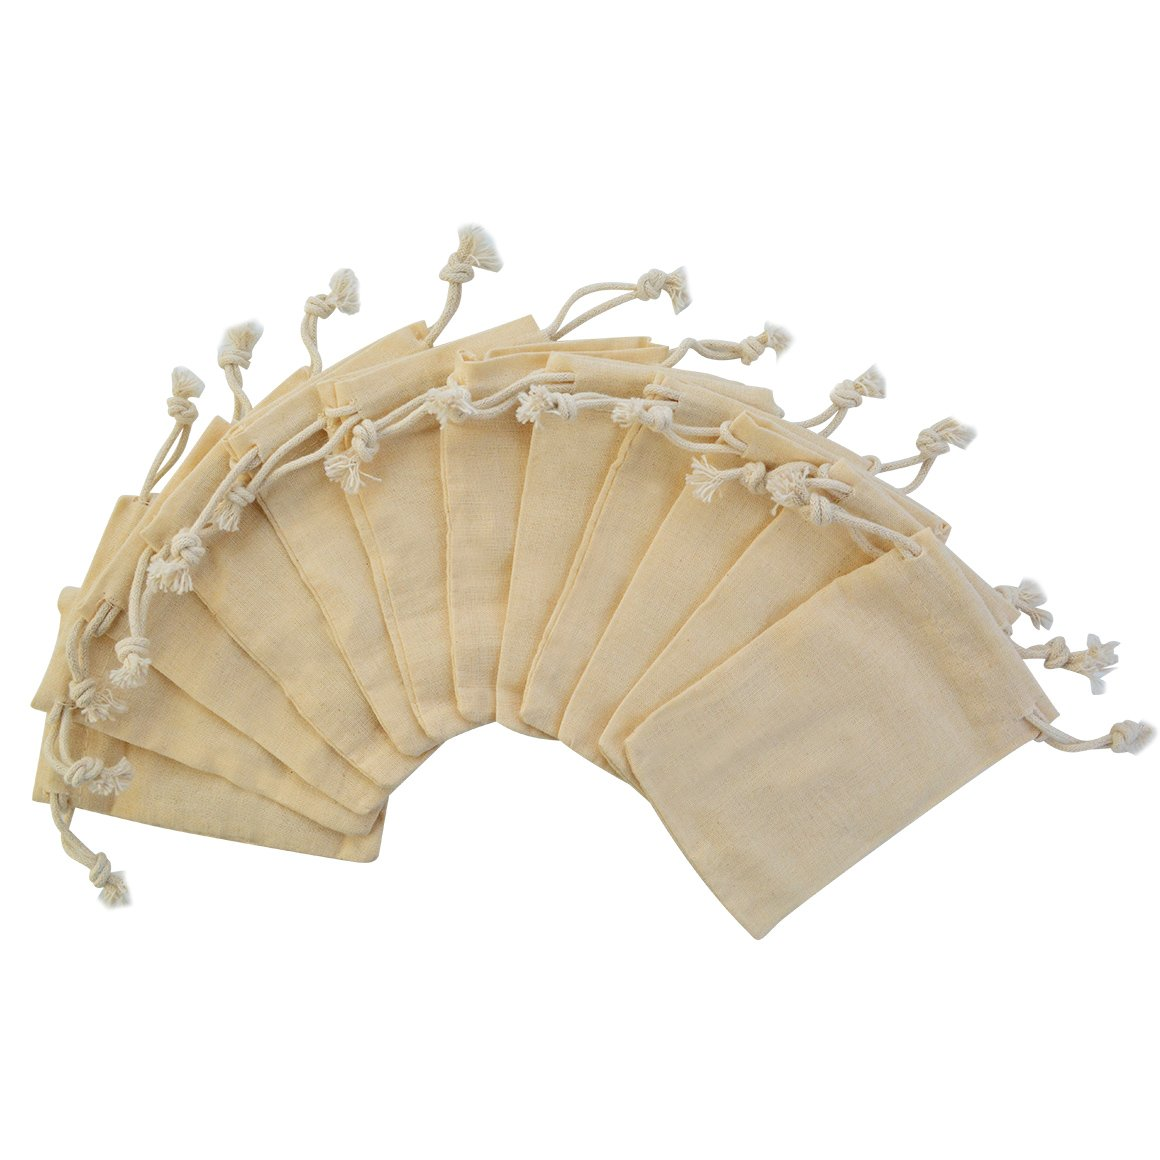 Miayon Pack of 12pcs 2.75x4 Inch Double Drawstring Cotton Muslin Bags Reusable Bags Tea Bags Souvenir Gift Bag